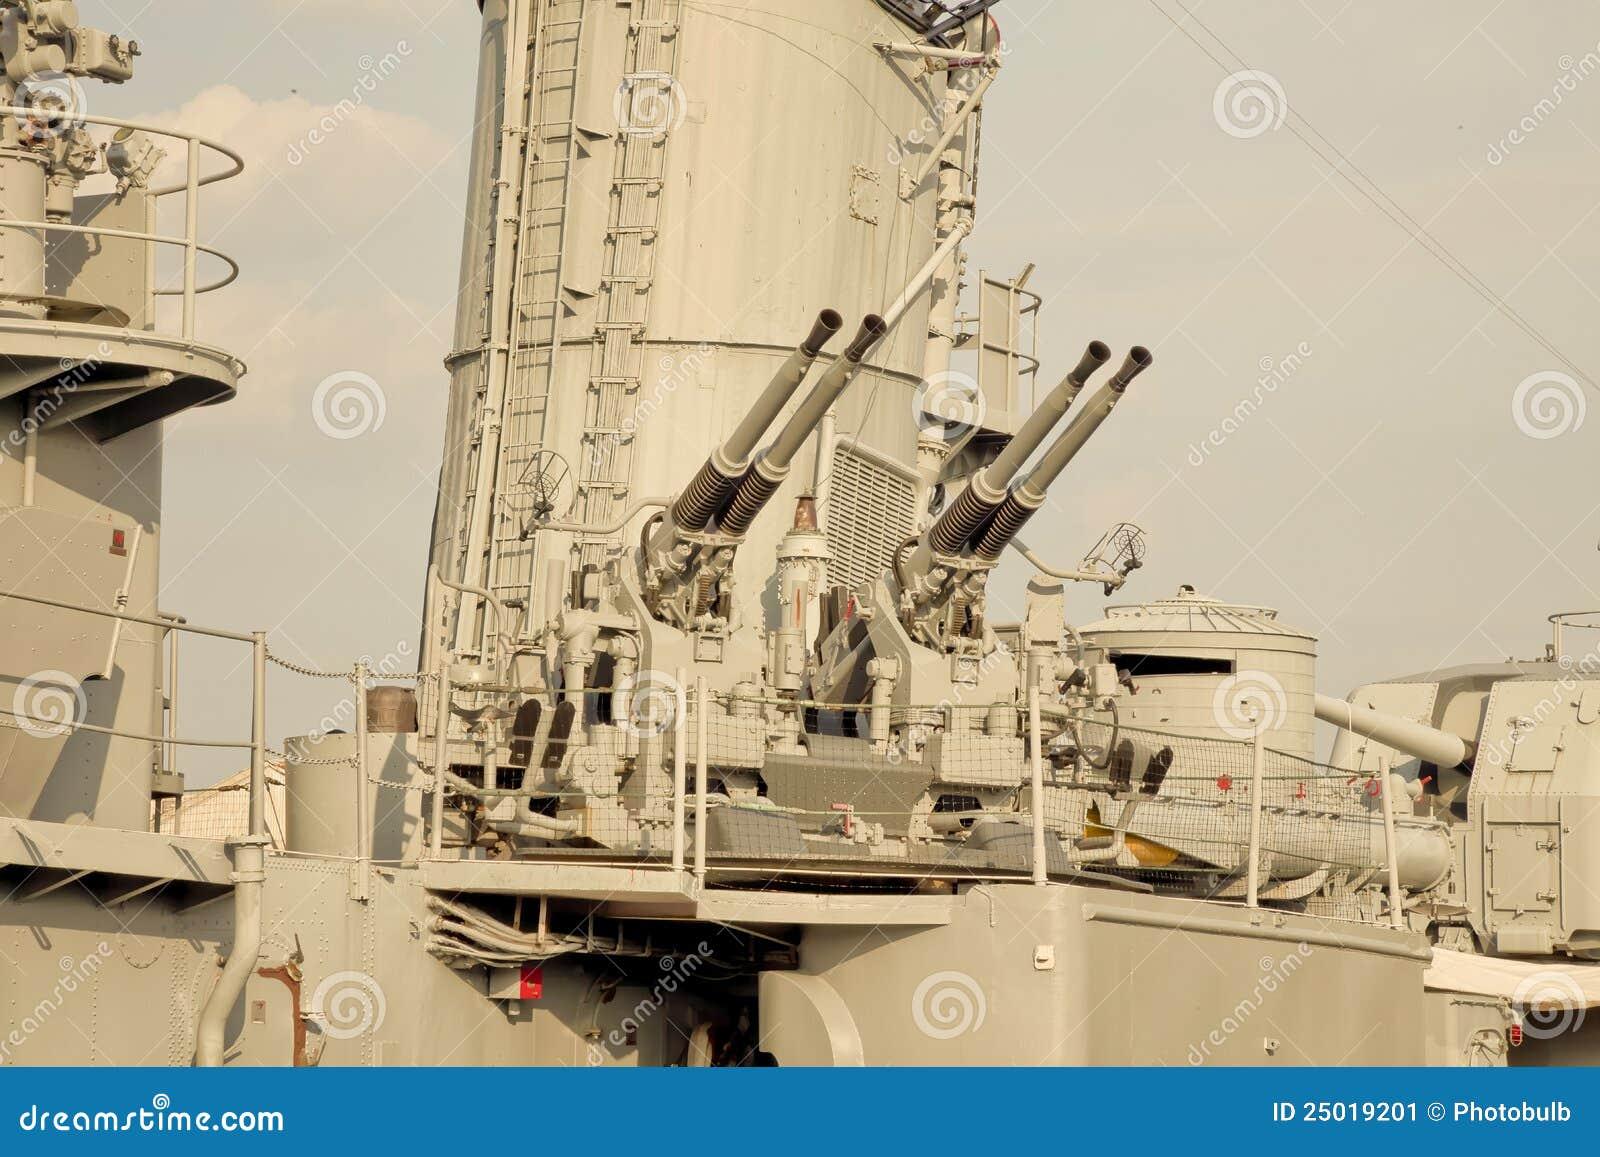 Machine Guns On World War II Destroyer Stock Image - Image of